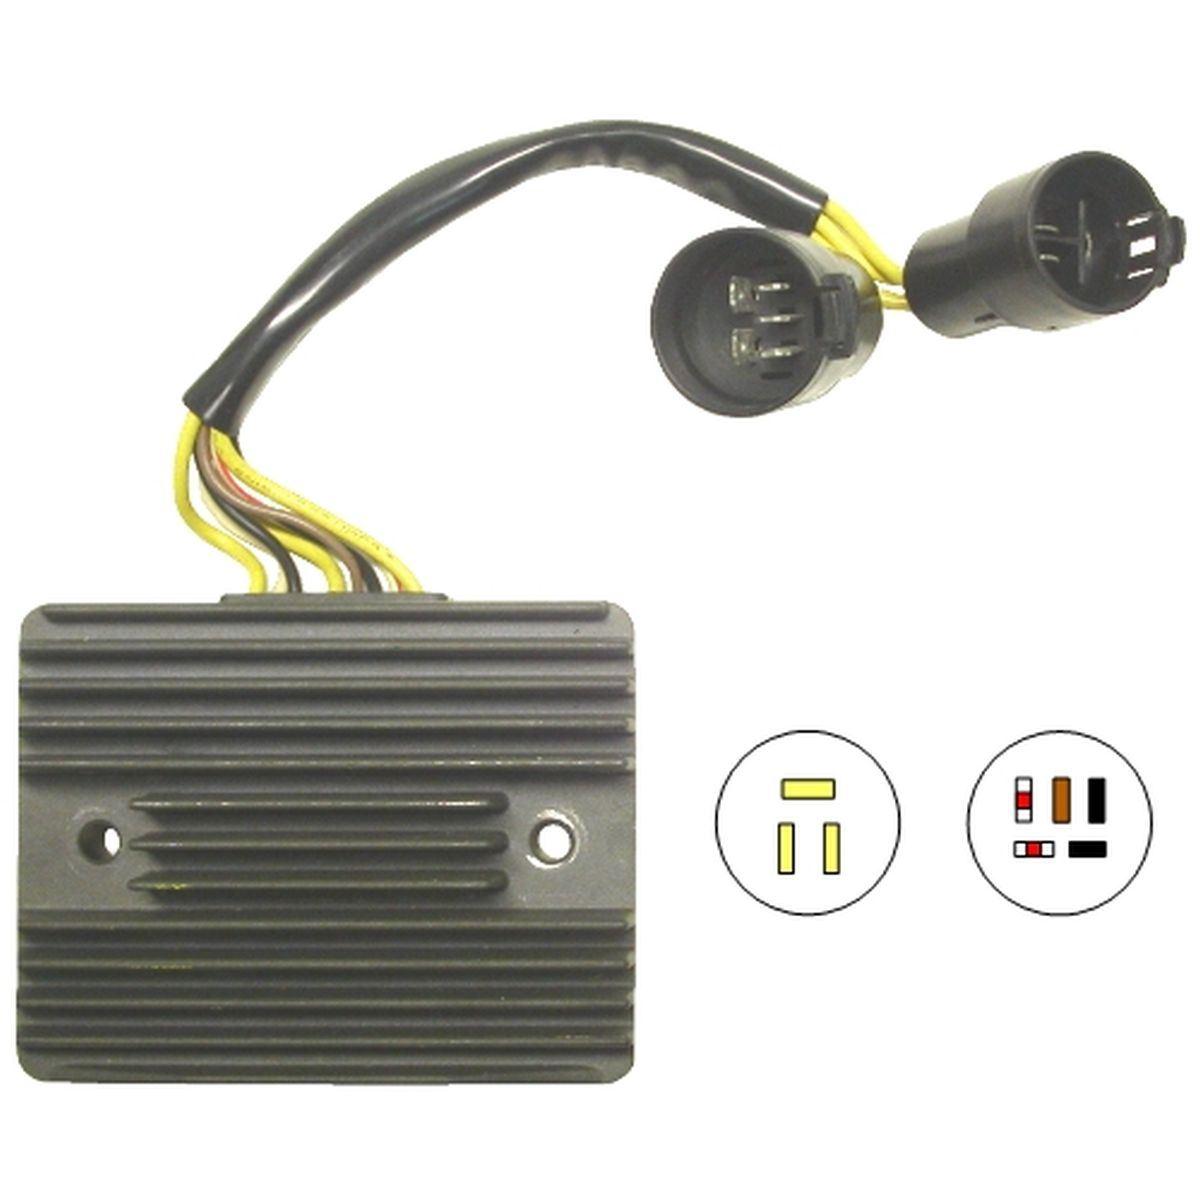 hight resolution of kawasaki zx12r wiring harness kawasaki zzr1400 wiring zx12r wiring diagram zx12r wiring diagram